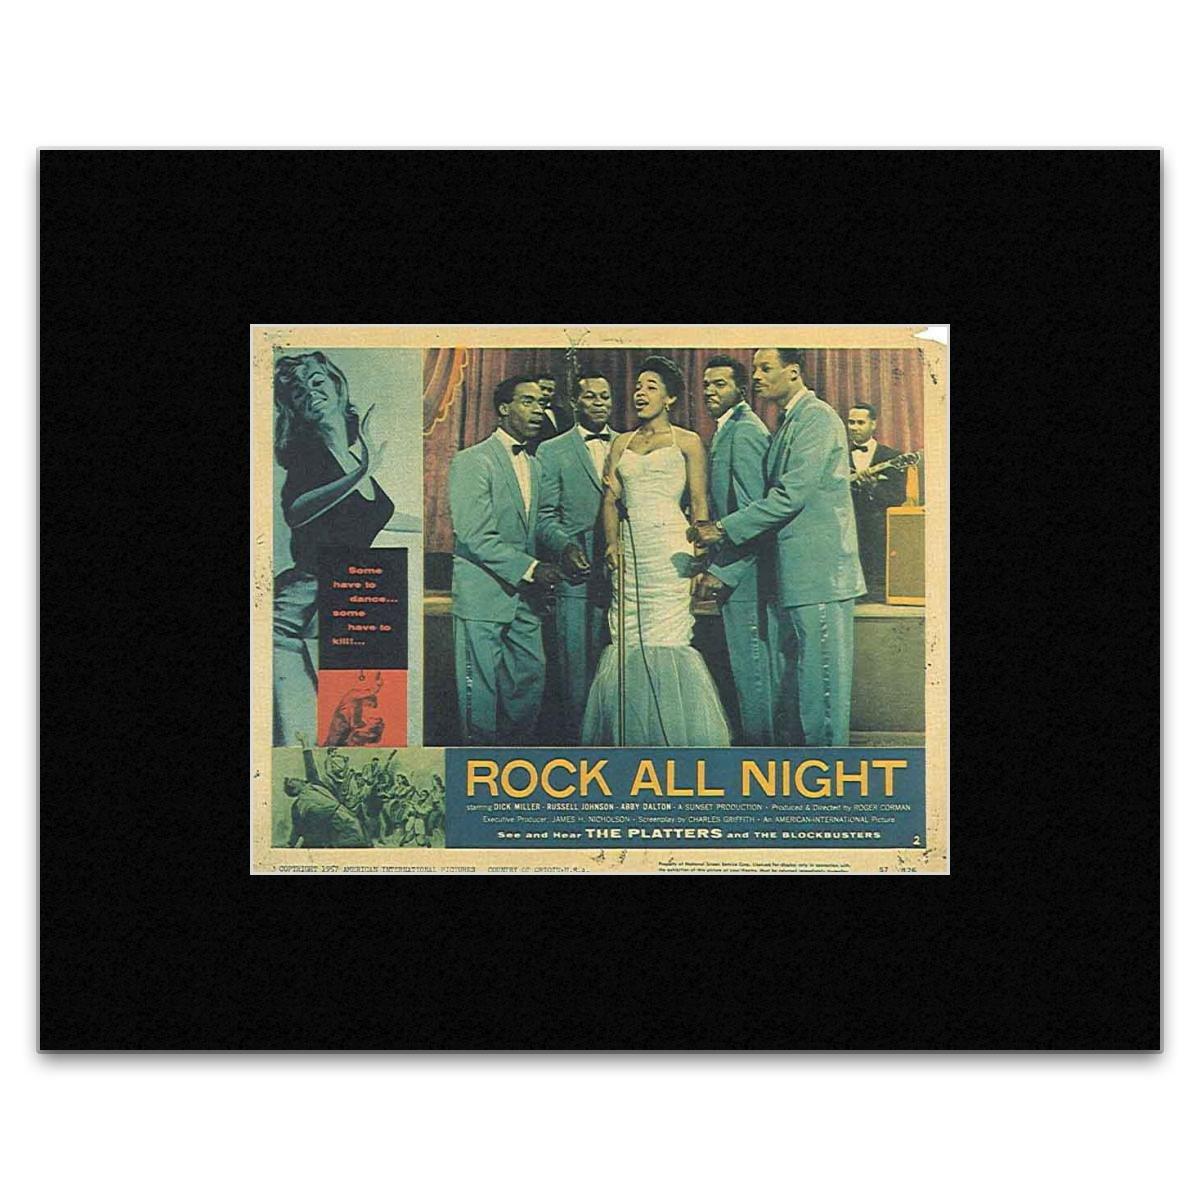 The Platters - Rock All Night 1957 Lobby Card Mini Poster - 20.3x25.4cm